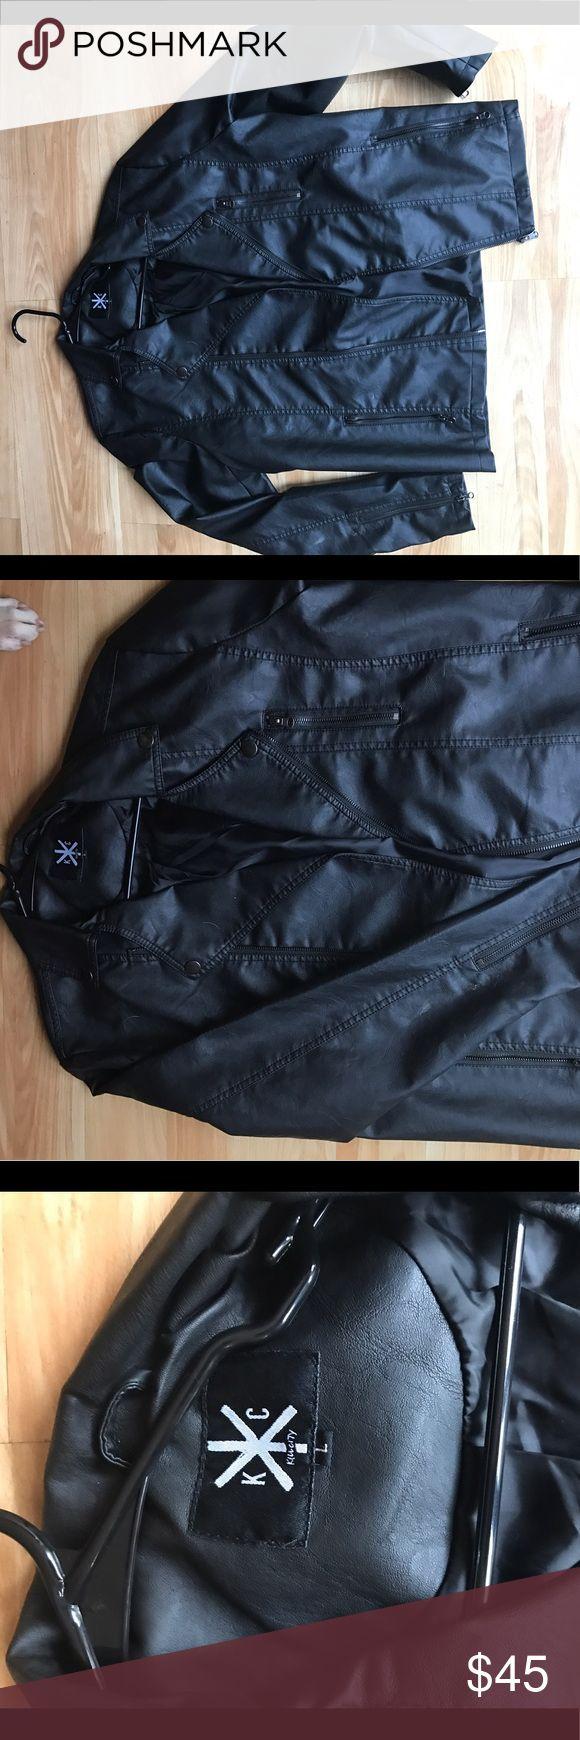 MENS ASOS LEATHER JACKET Worn once, good as new. Black leather men's LARGE jacket. ASOS Jackets & Coats Bomber & Varsity